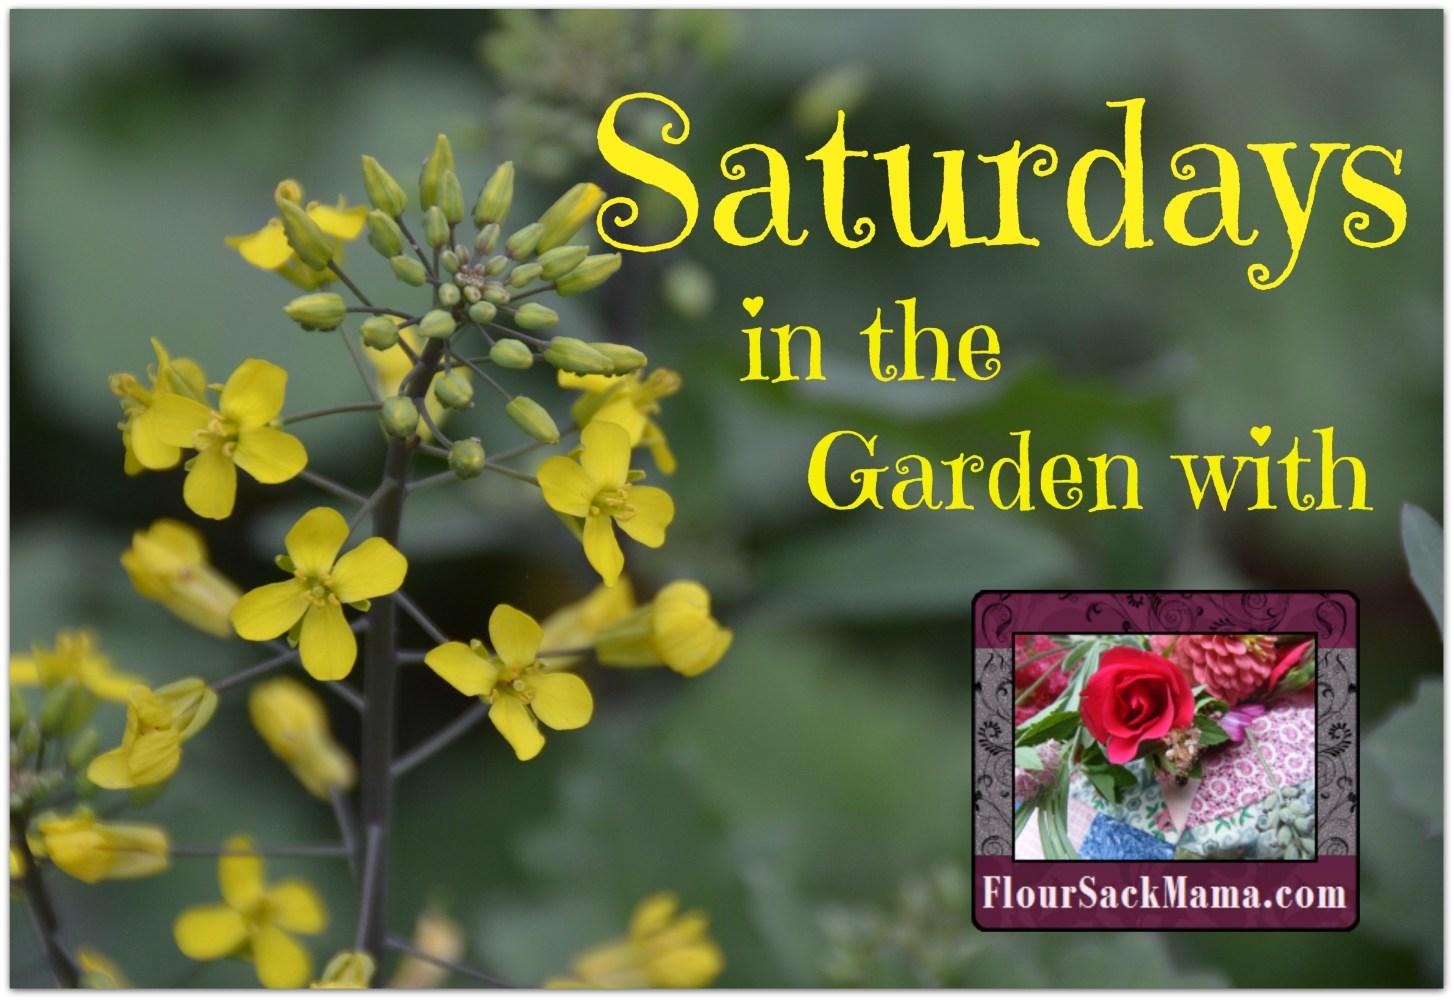 Saturdays in the garden with FlourSackMama.com (tiny yellow kale flowers)